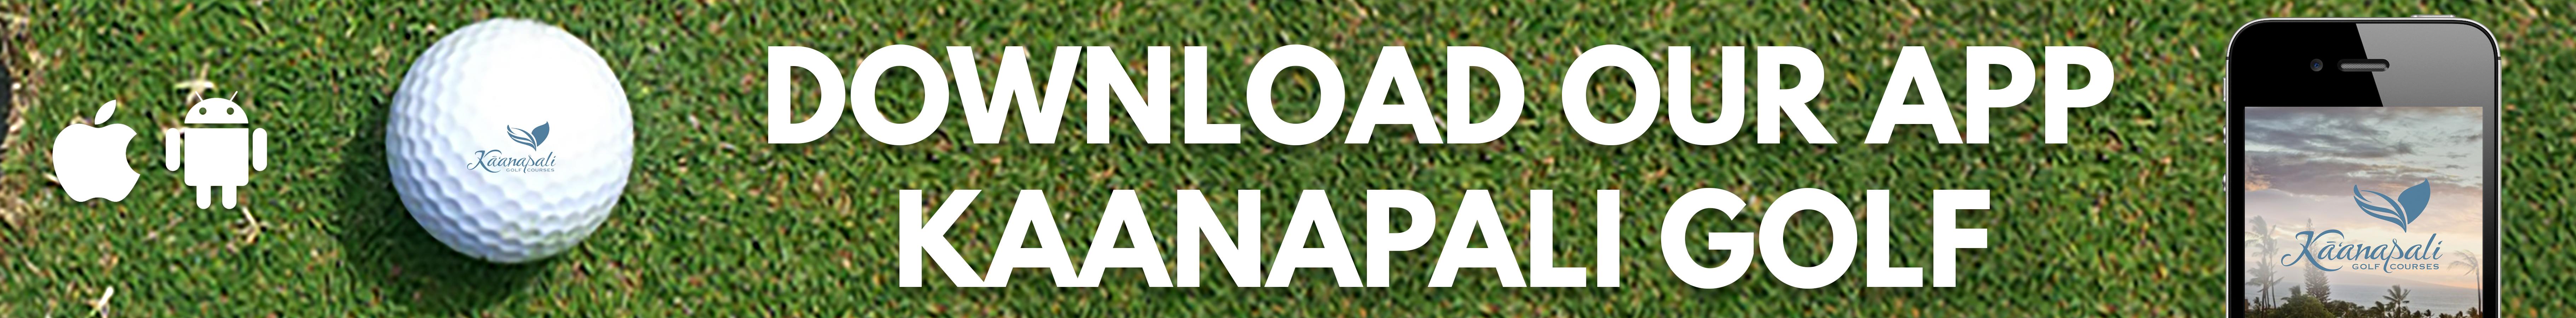 Kaanapali Golf App